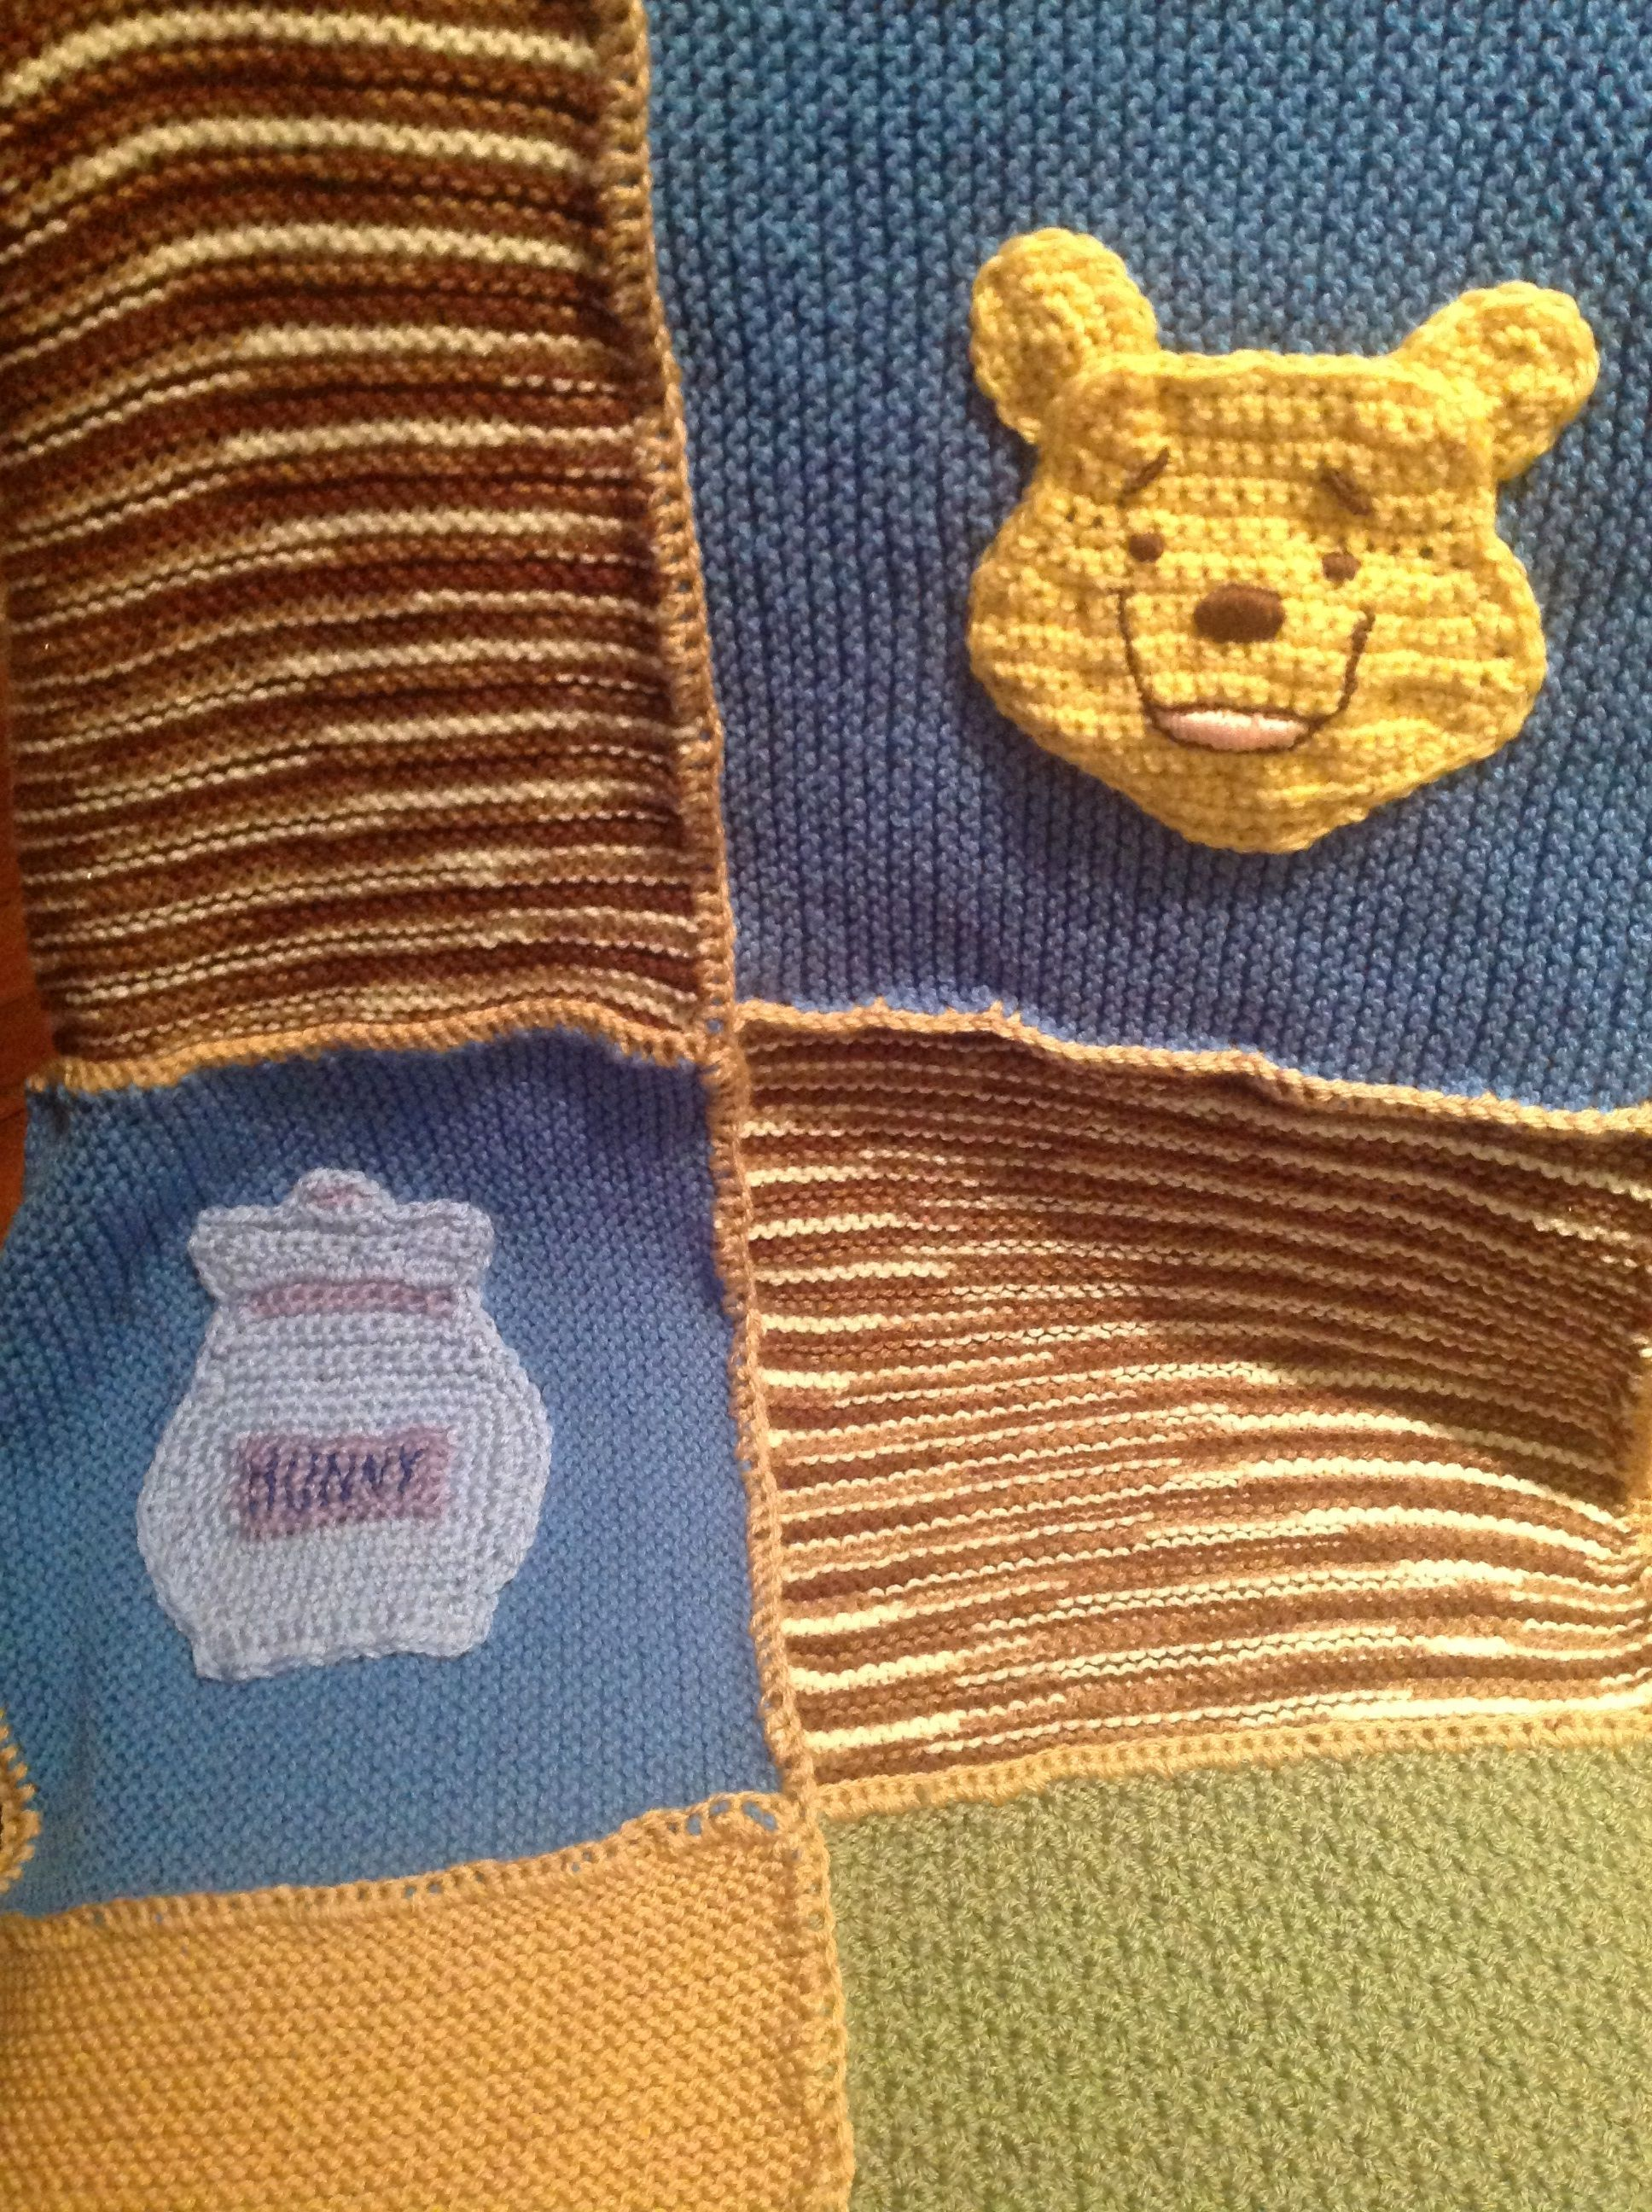 Winnie the Pooh crochet applique. Ravelry coffeekid589 | Craftiness ...